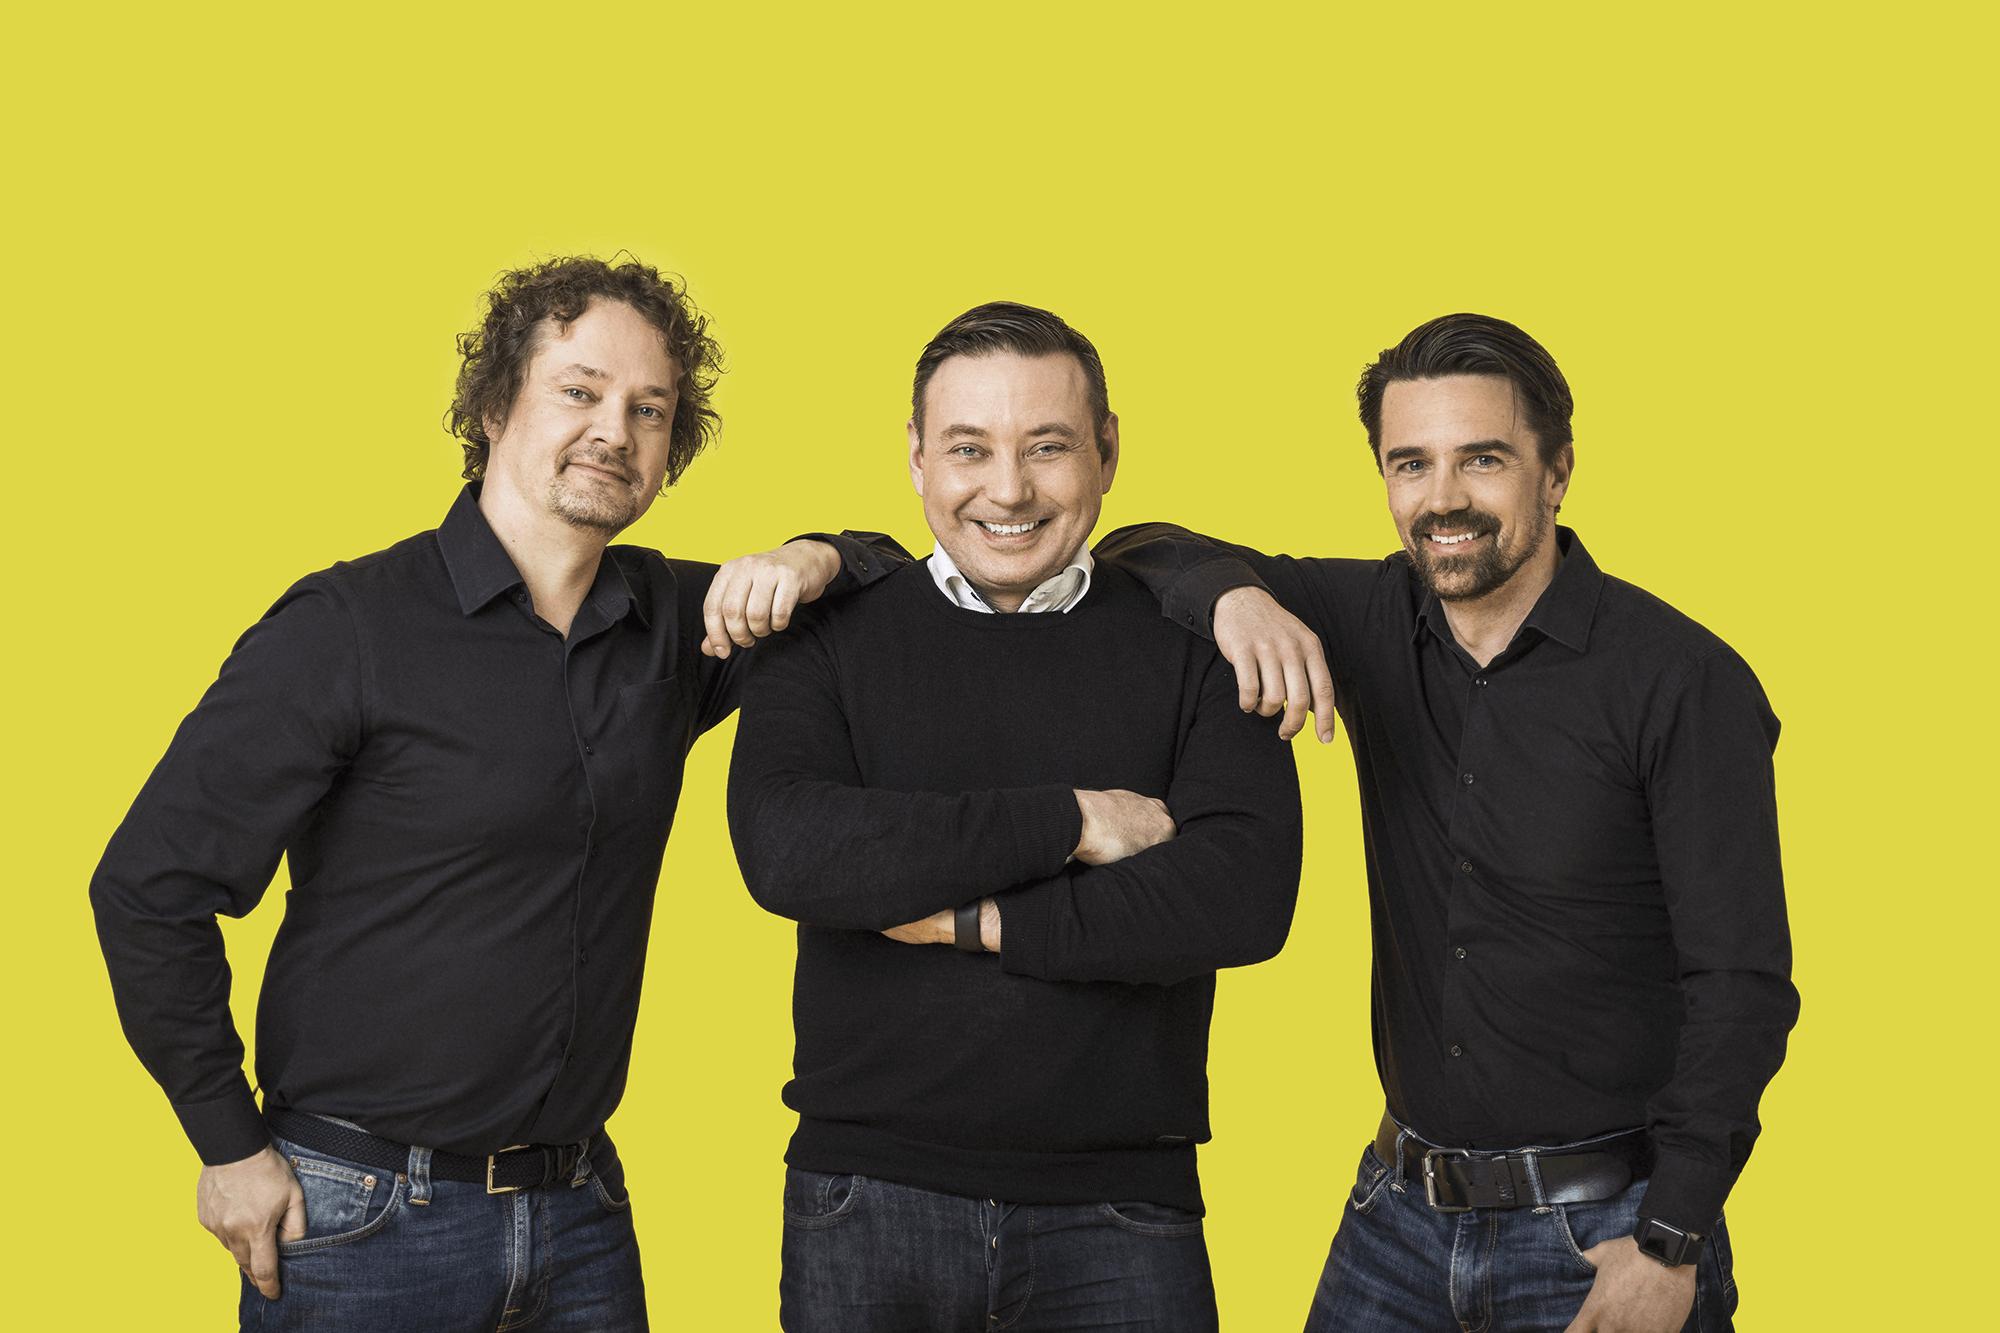 HappySignals founders